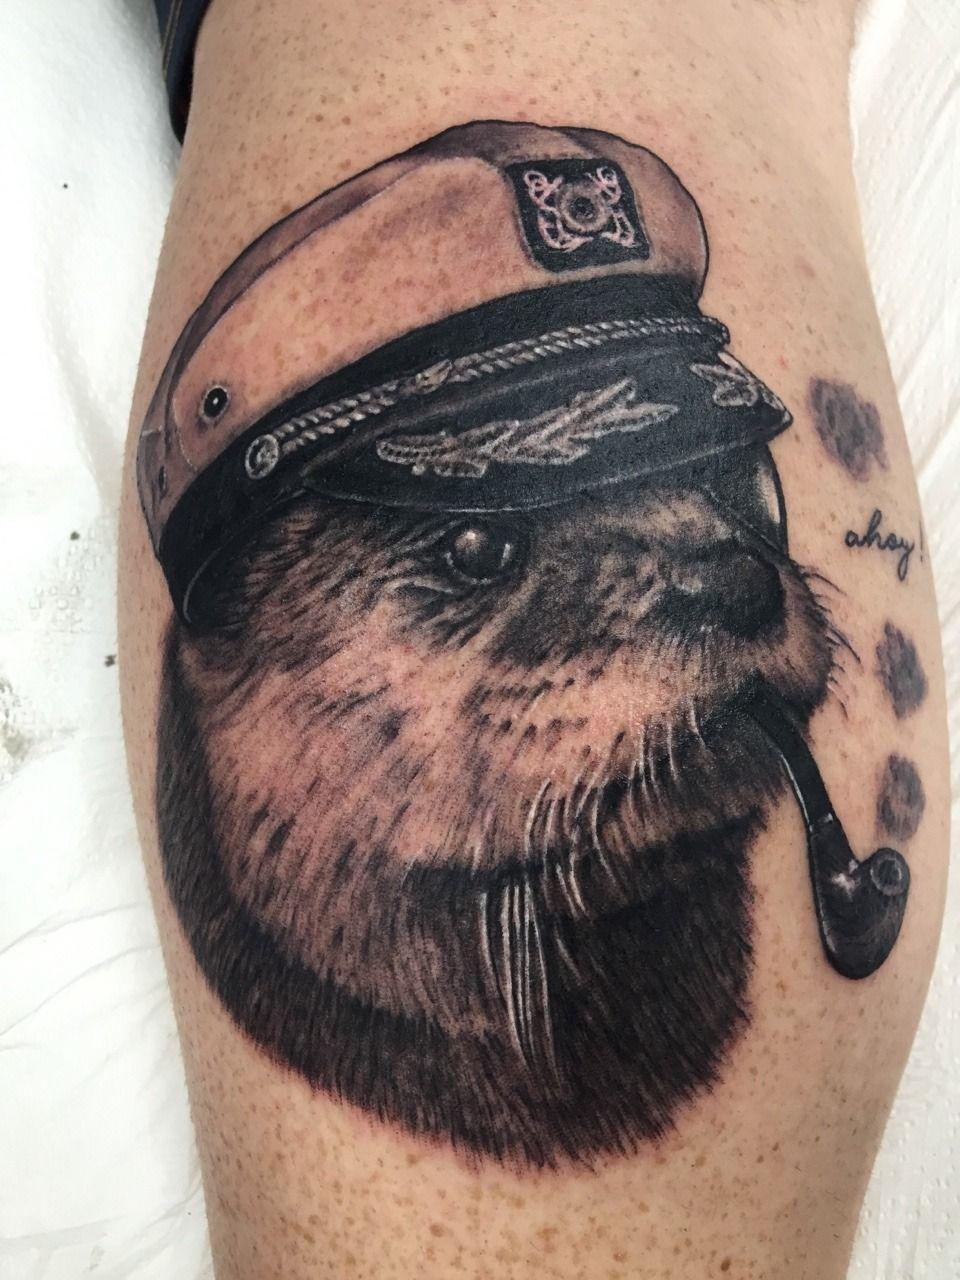 Captain Sea Otter Artist Emily Paul Oceanside Ny Ig Emilypaularts Otter Tattoo Body Art Tattoos Ink Tattoo